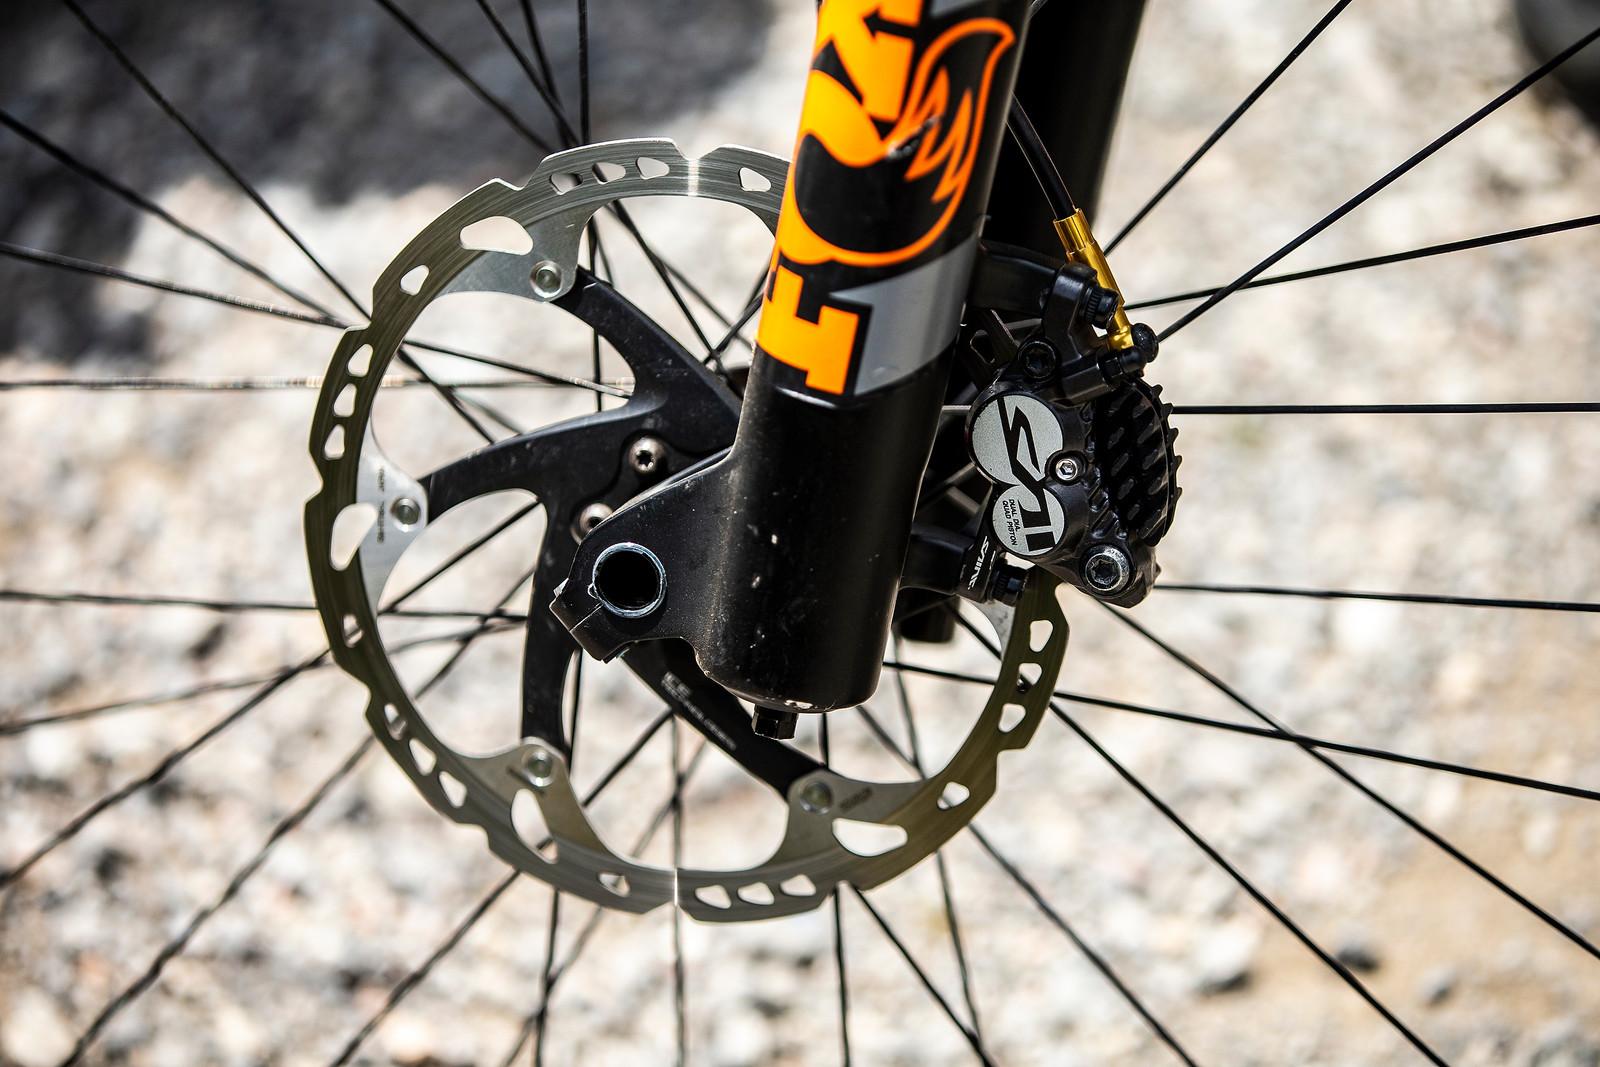 Shimano Saint Brakes, FOX 40 - WINNING BIKE - Tahnee Seagrave's Transition TR11 - Mountain Biking Pictures - Vital MTB